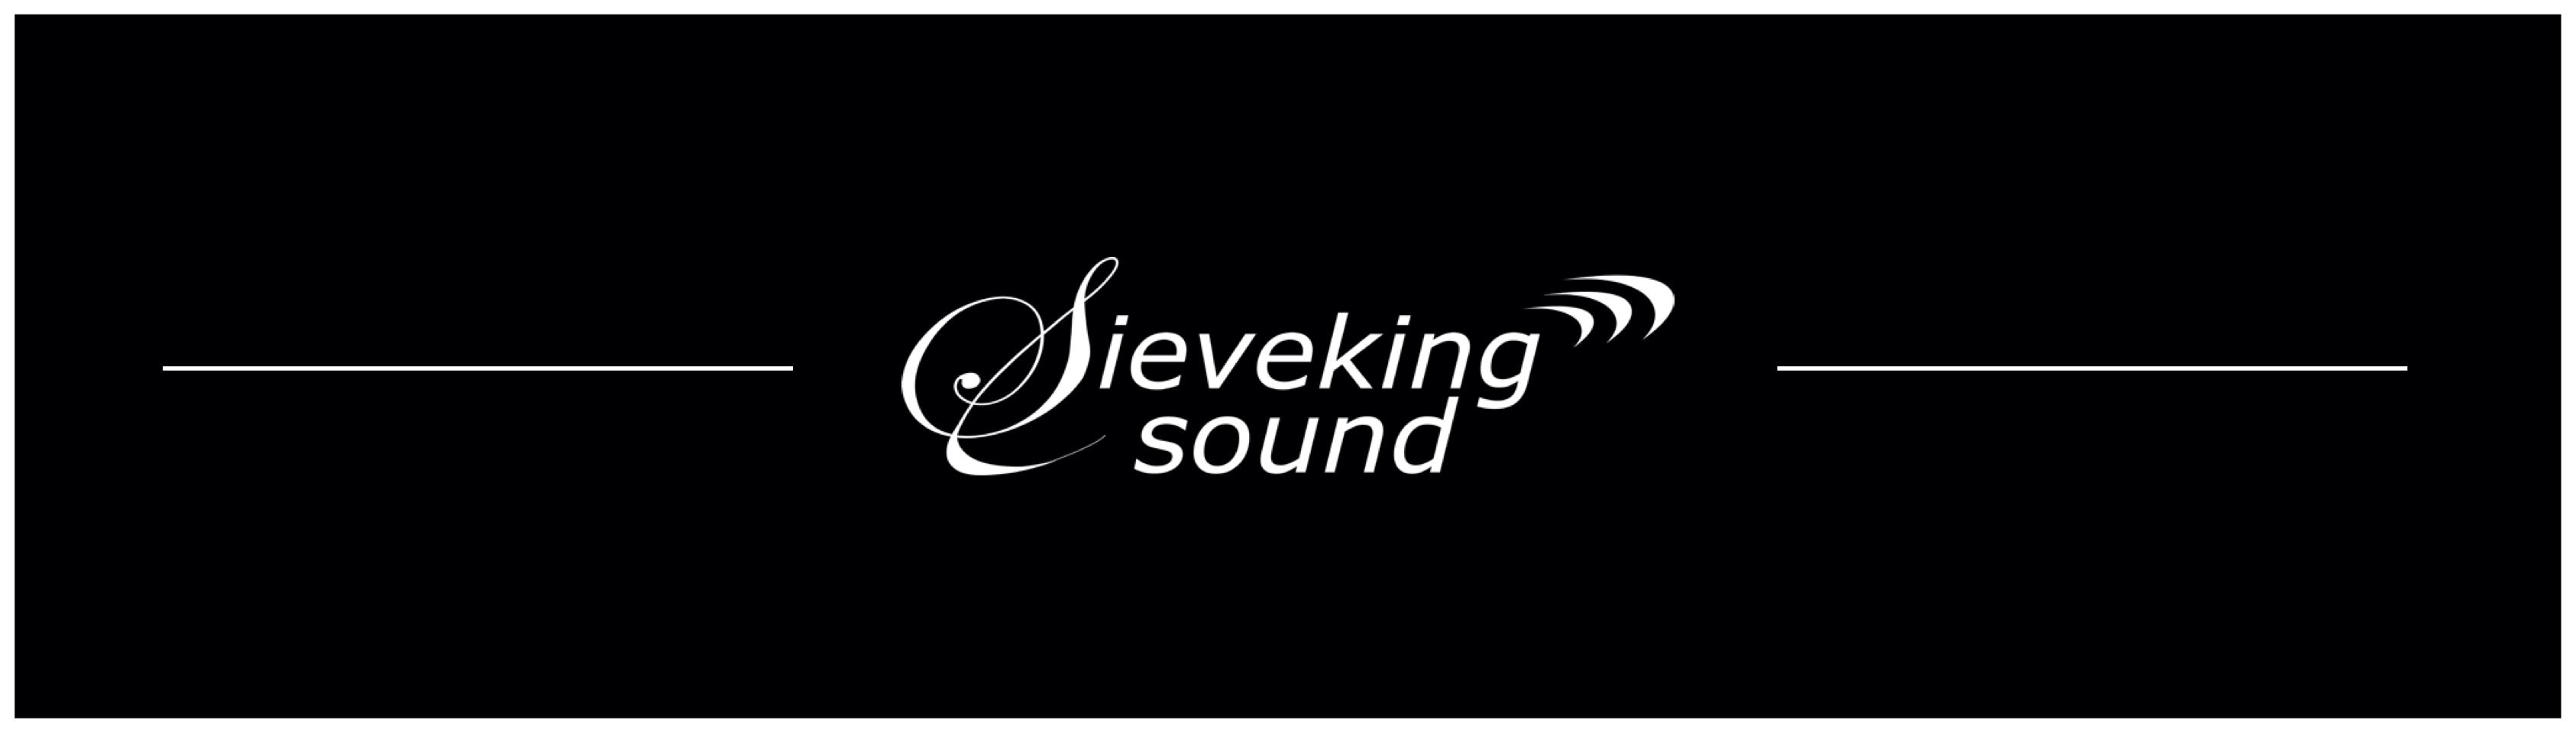 seiveking-logo.jpg